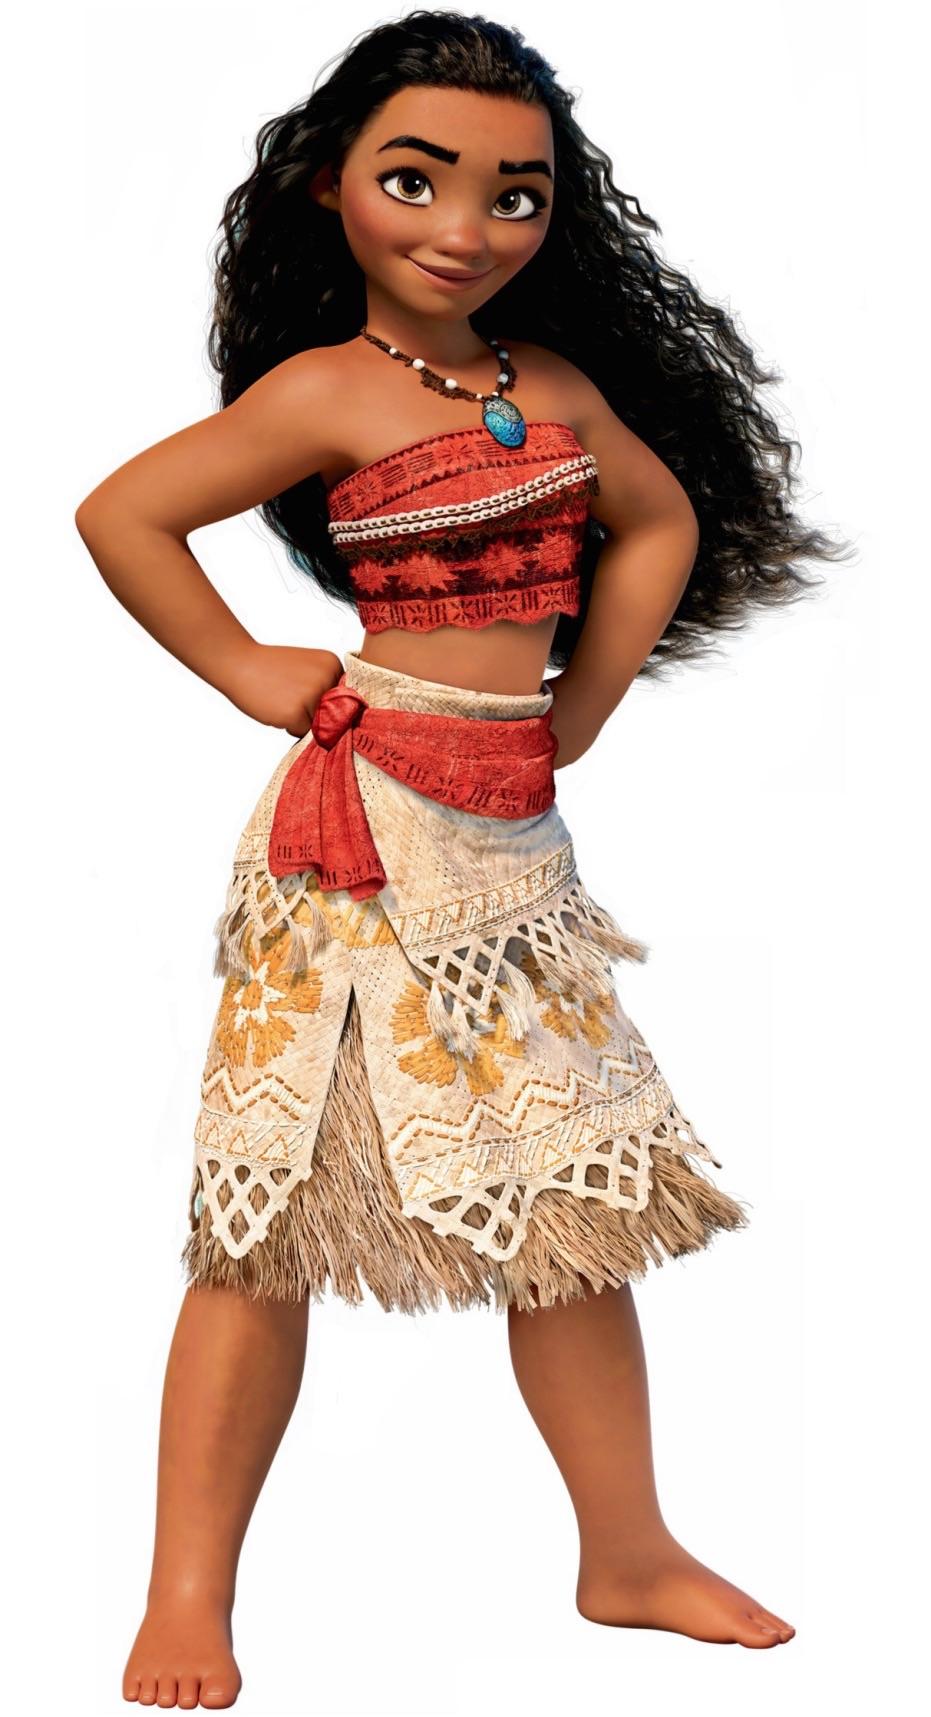 The Little Polynesian Girl